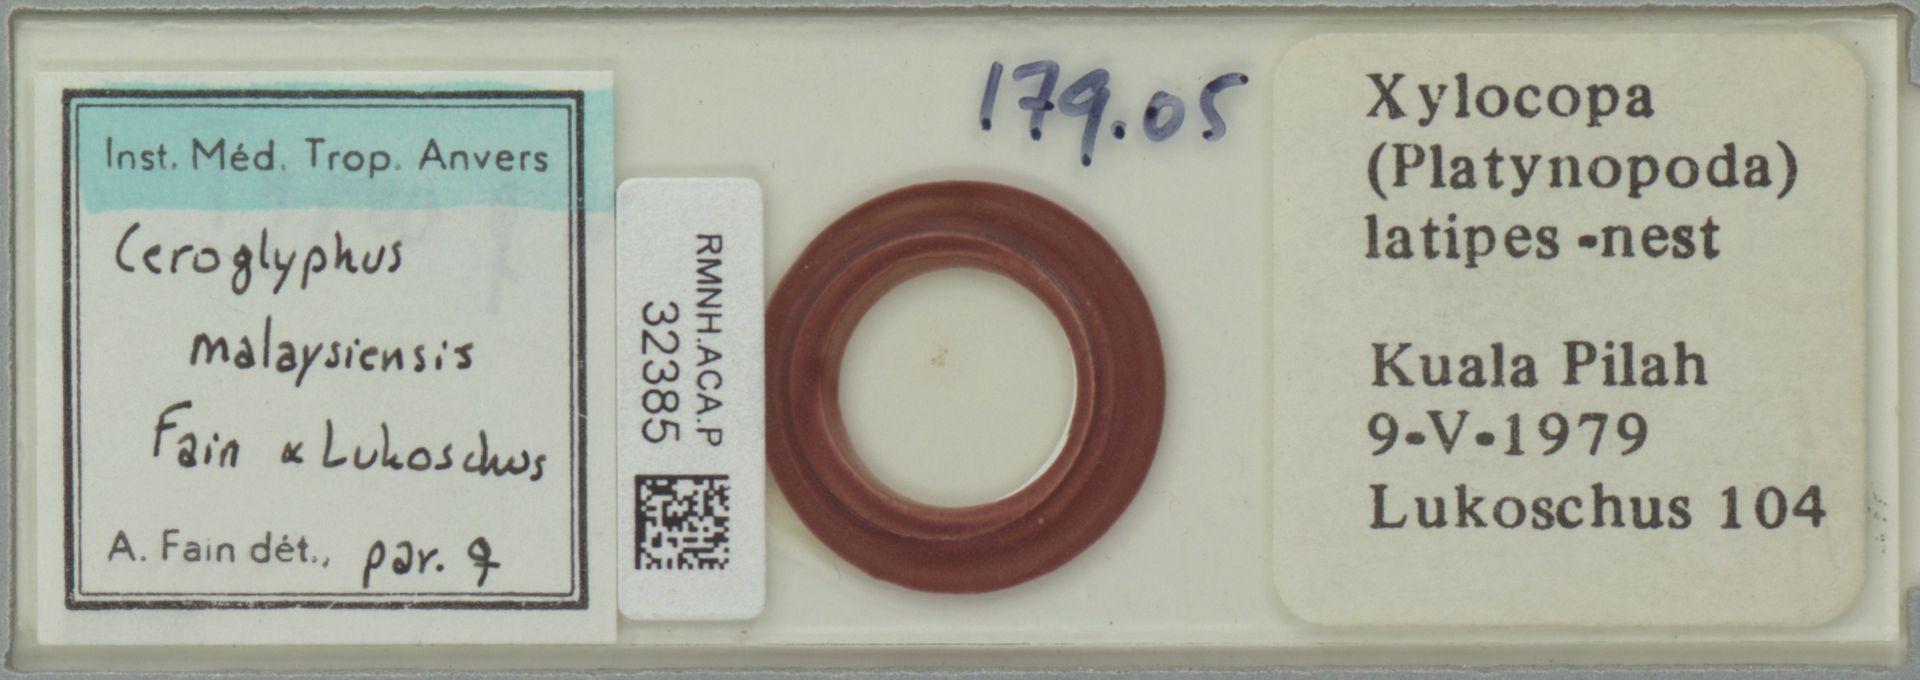 RMNH.ACA.P.32385 | Ceroglyphus malaysiensis Fain & Lukoschus